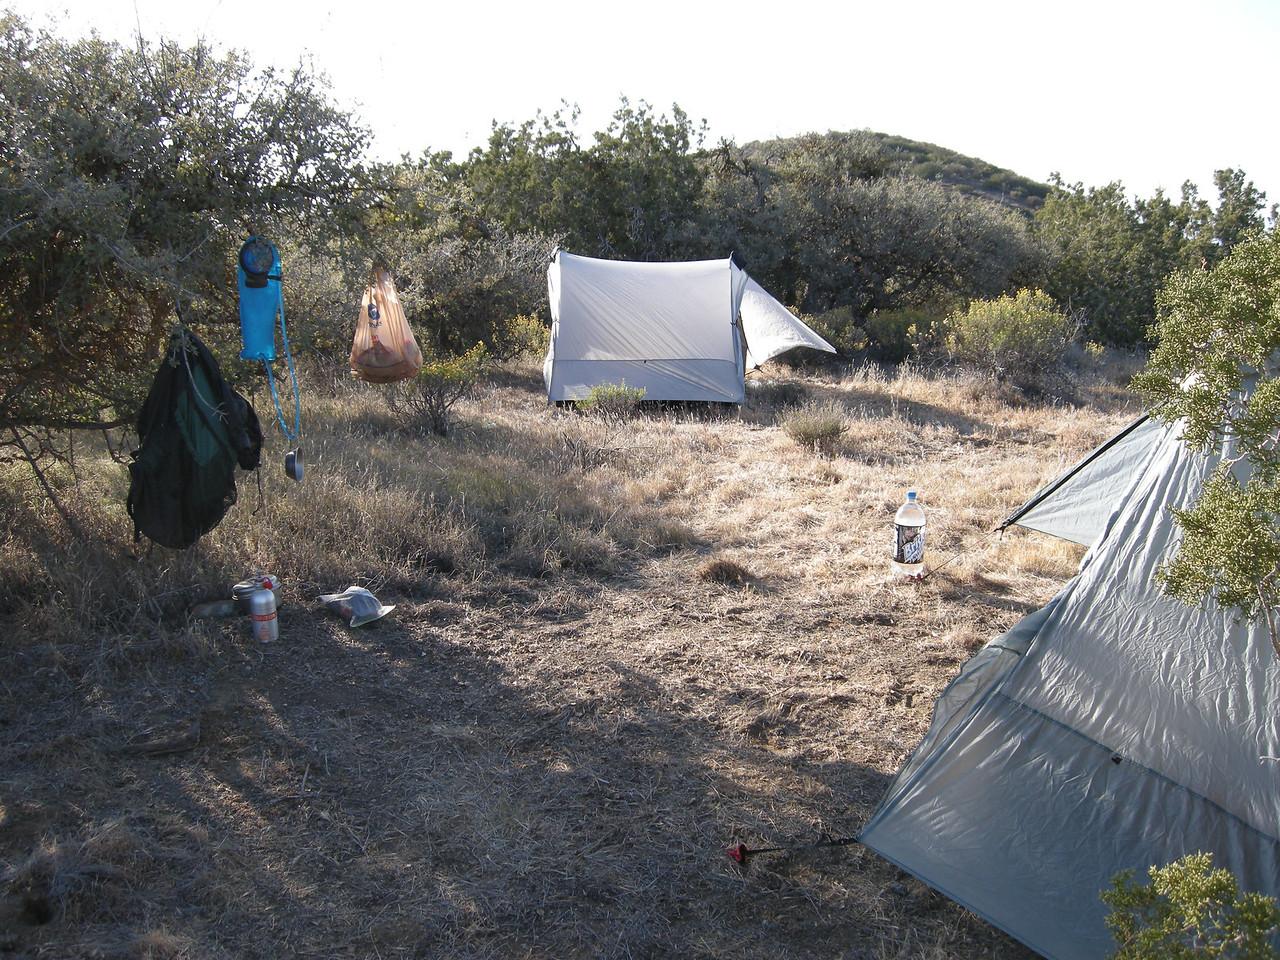 A dry but pleasant campsite atop the ridge.